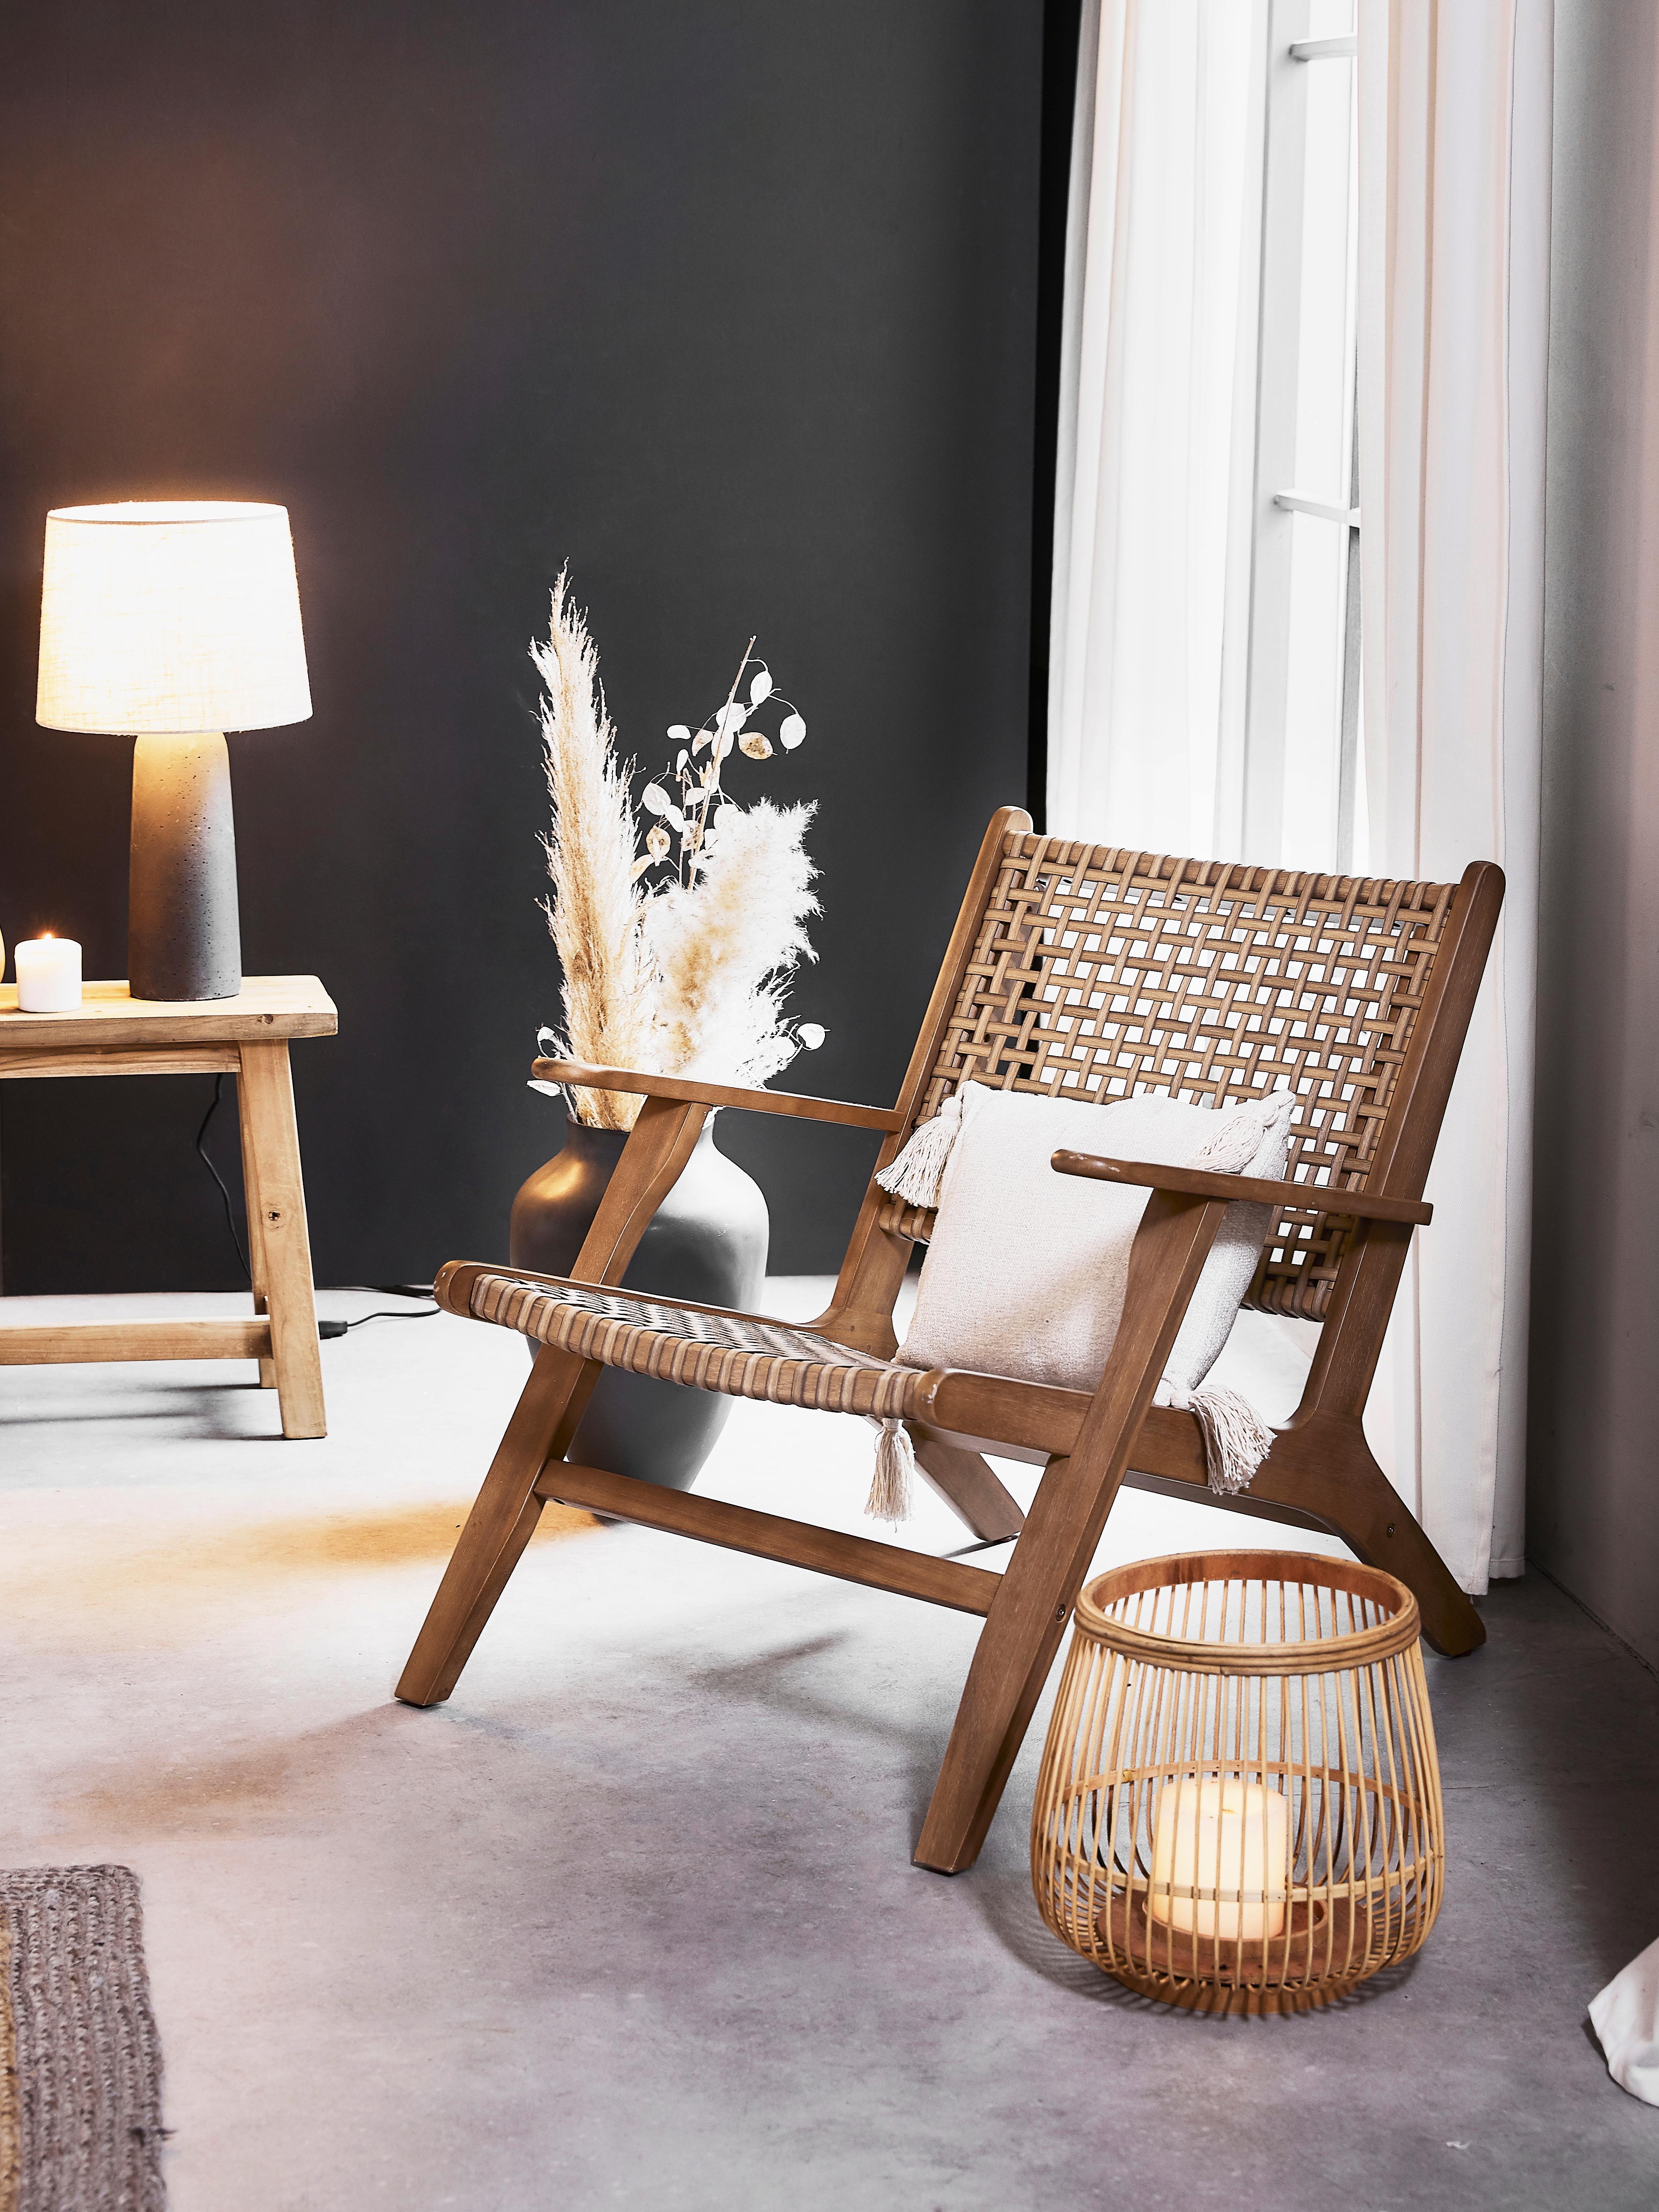 Fauteuil lounge en cannage Grignoon, Bois d'acacia, beige